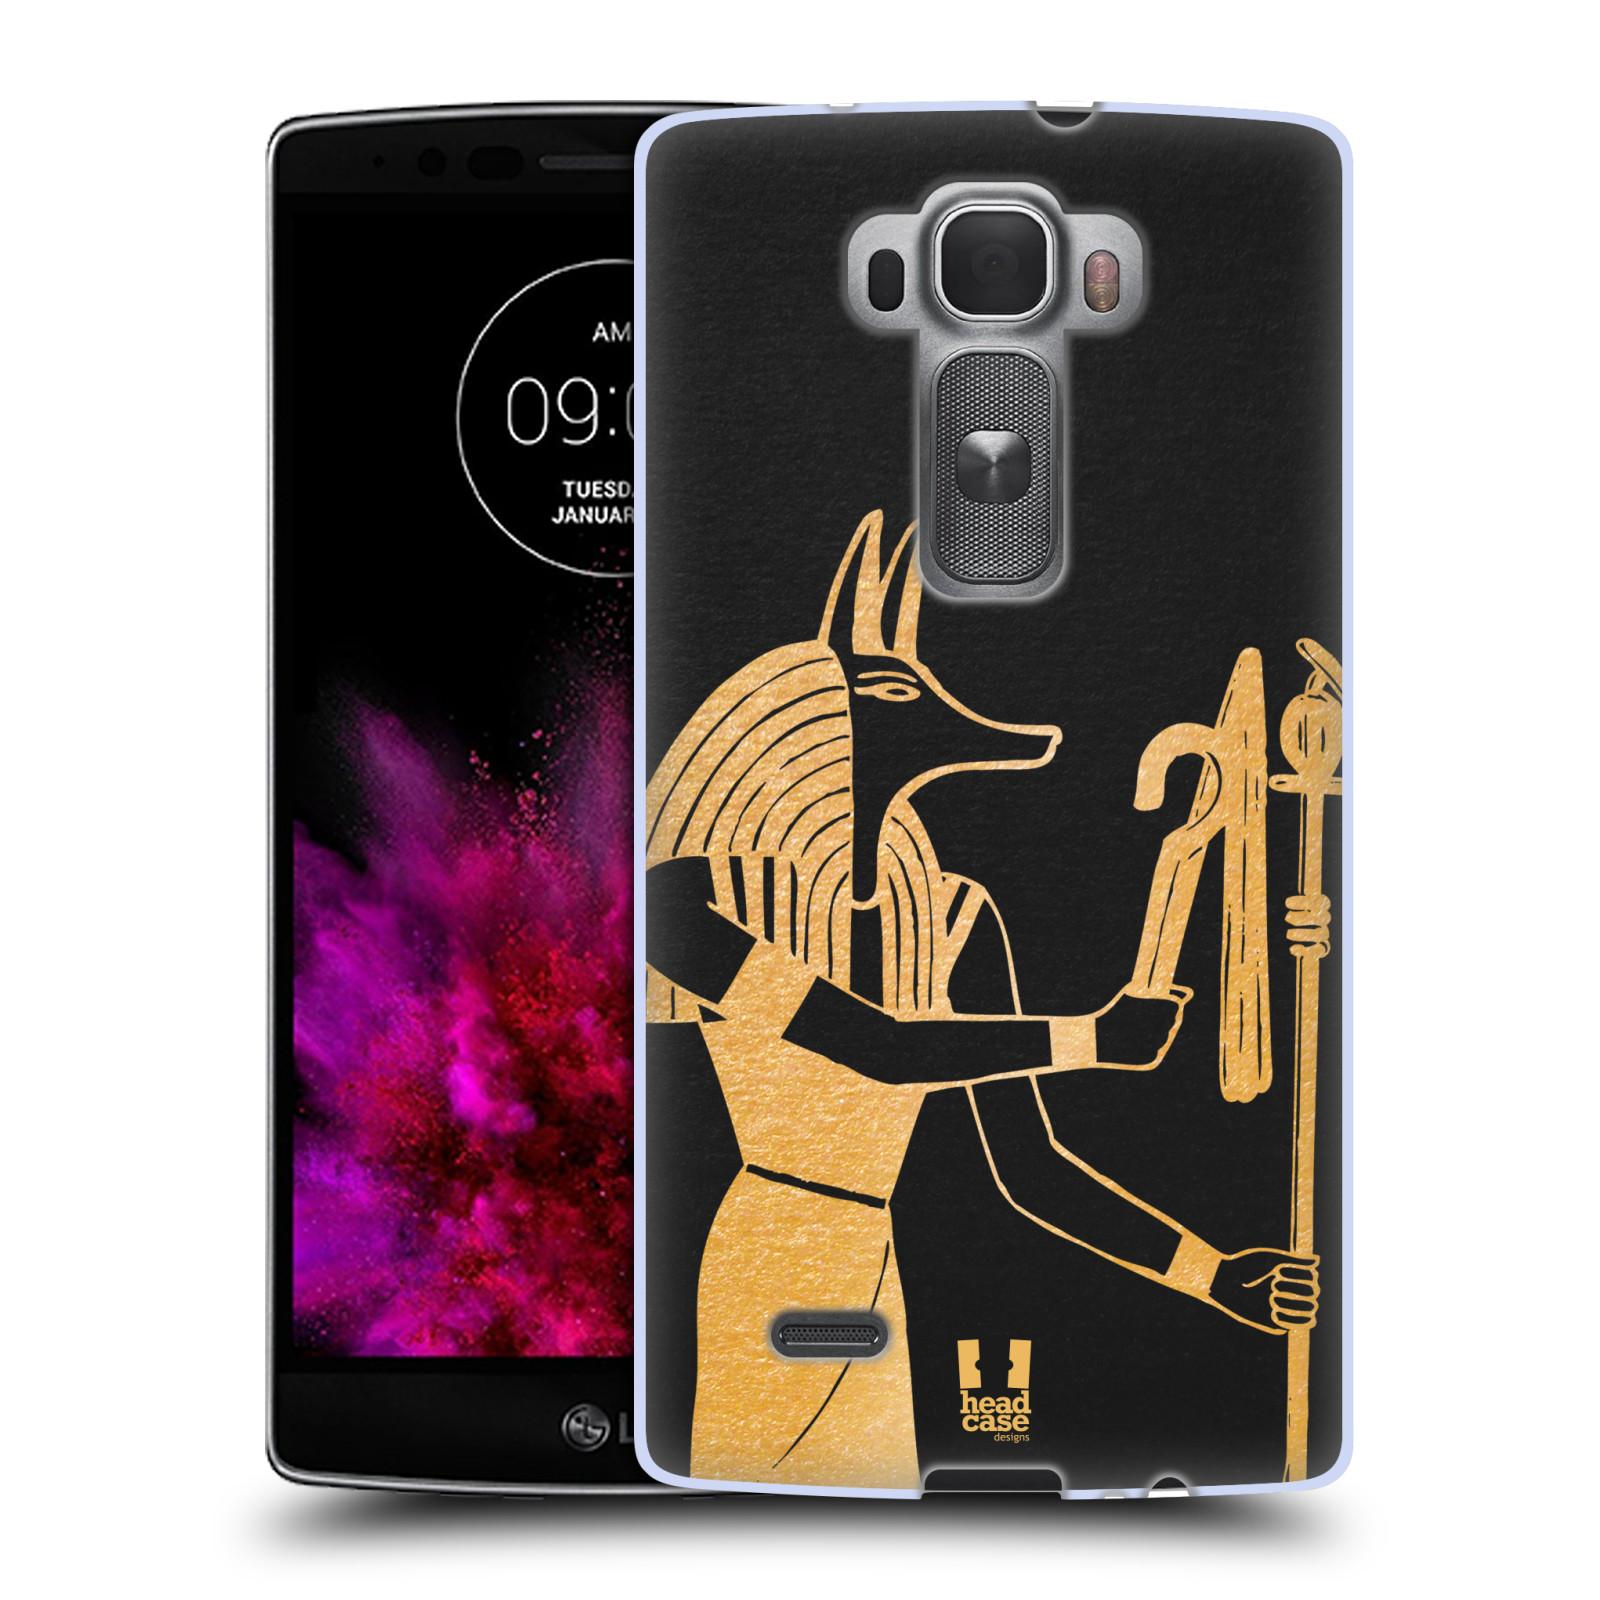 Silikonové pouzdro na mobil LG G Flex 2 HEAD CASE EGYPT ANUBIS (Silikonový kryt či obal na mobilní telefon LG G Flex 2 H955)